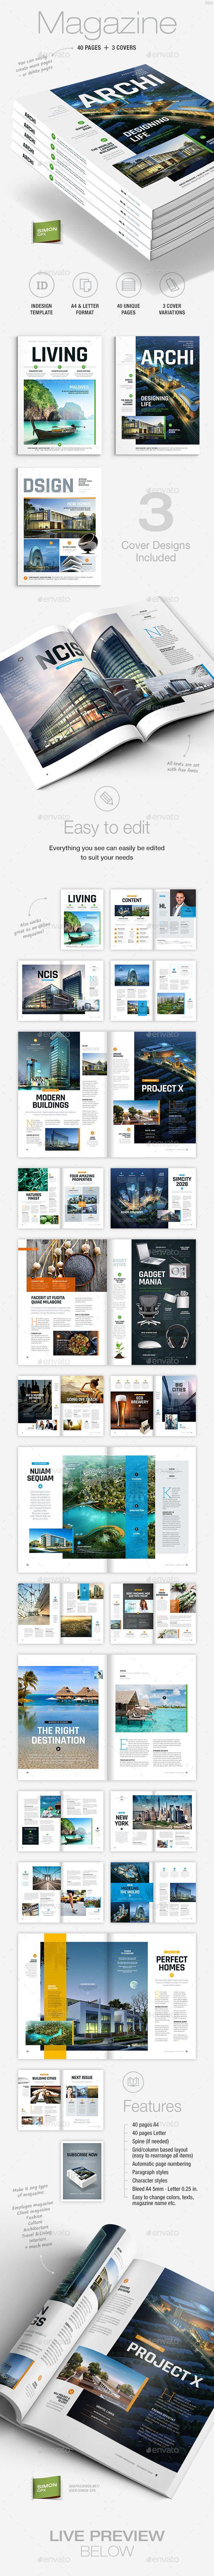 161 best Magazine | Grids & Templates images on Pinterest | Magazine ...